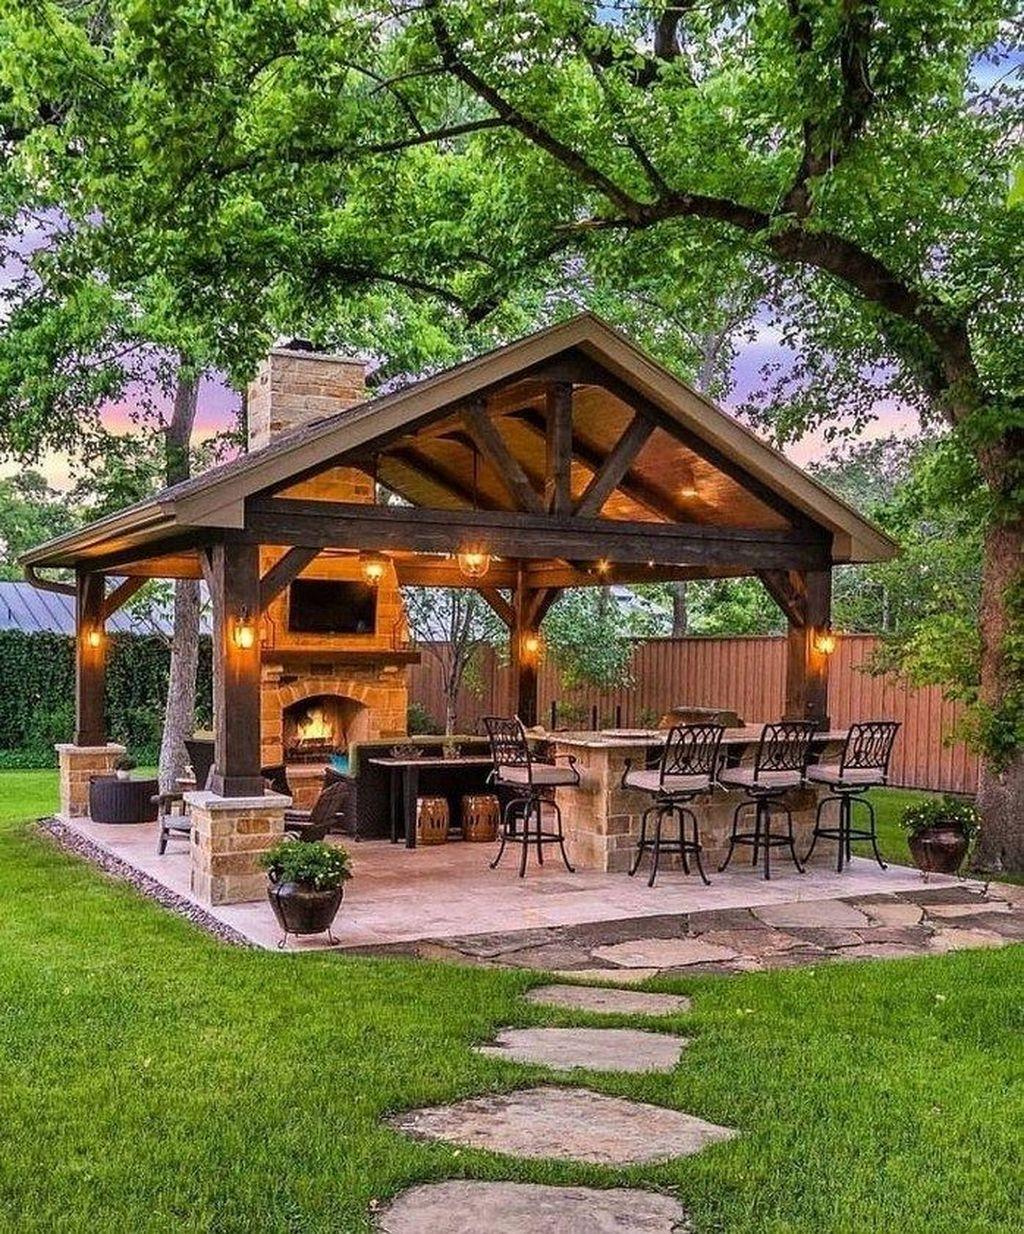 40 Best Patio Design Ideas To Really Enjoy Your Outdoor In 2021 Rustic Outdoor Fireplaces Outdoor Fireplace Designs Backyard Pavilion